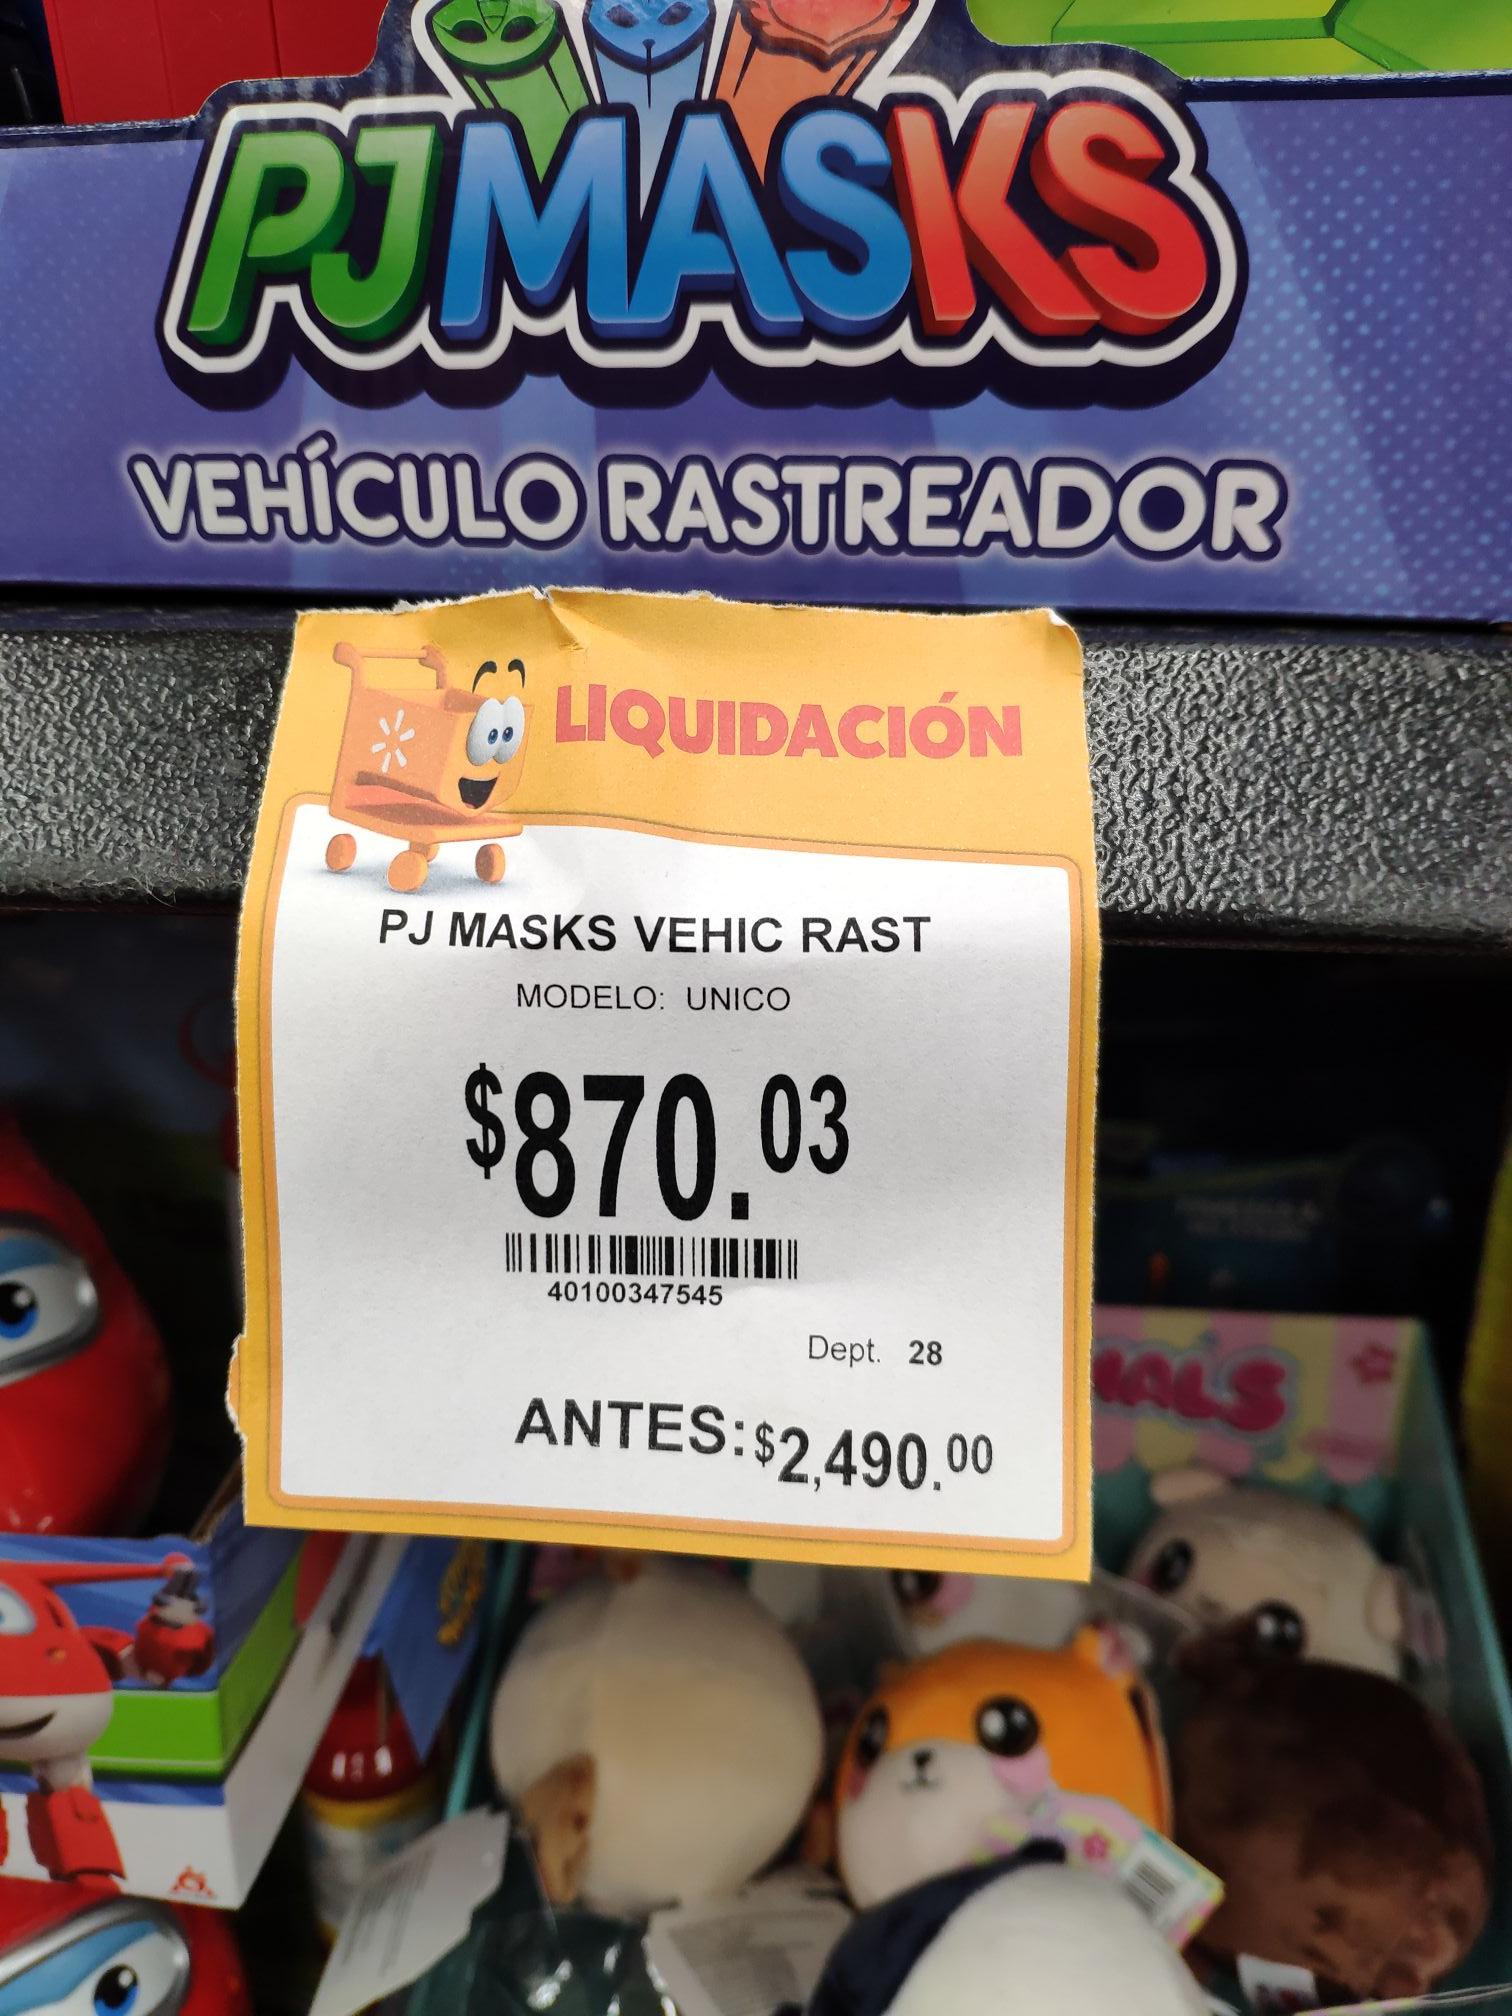 Walmart: PJ Masks Vehículo Rastreador